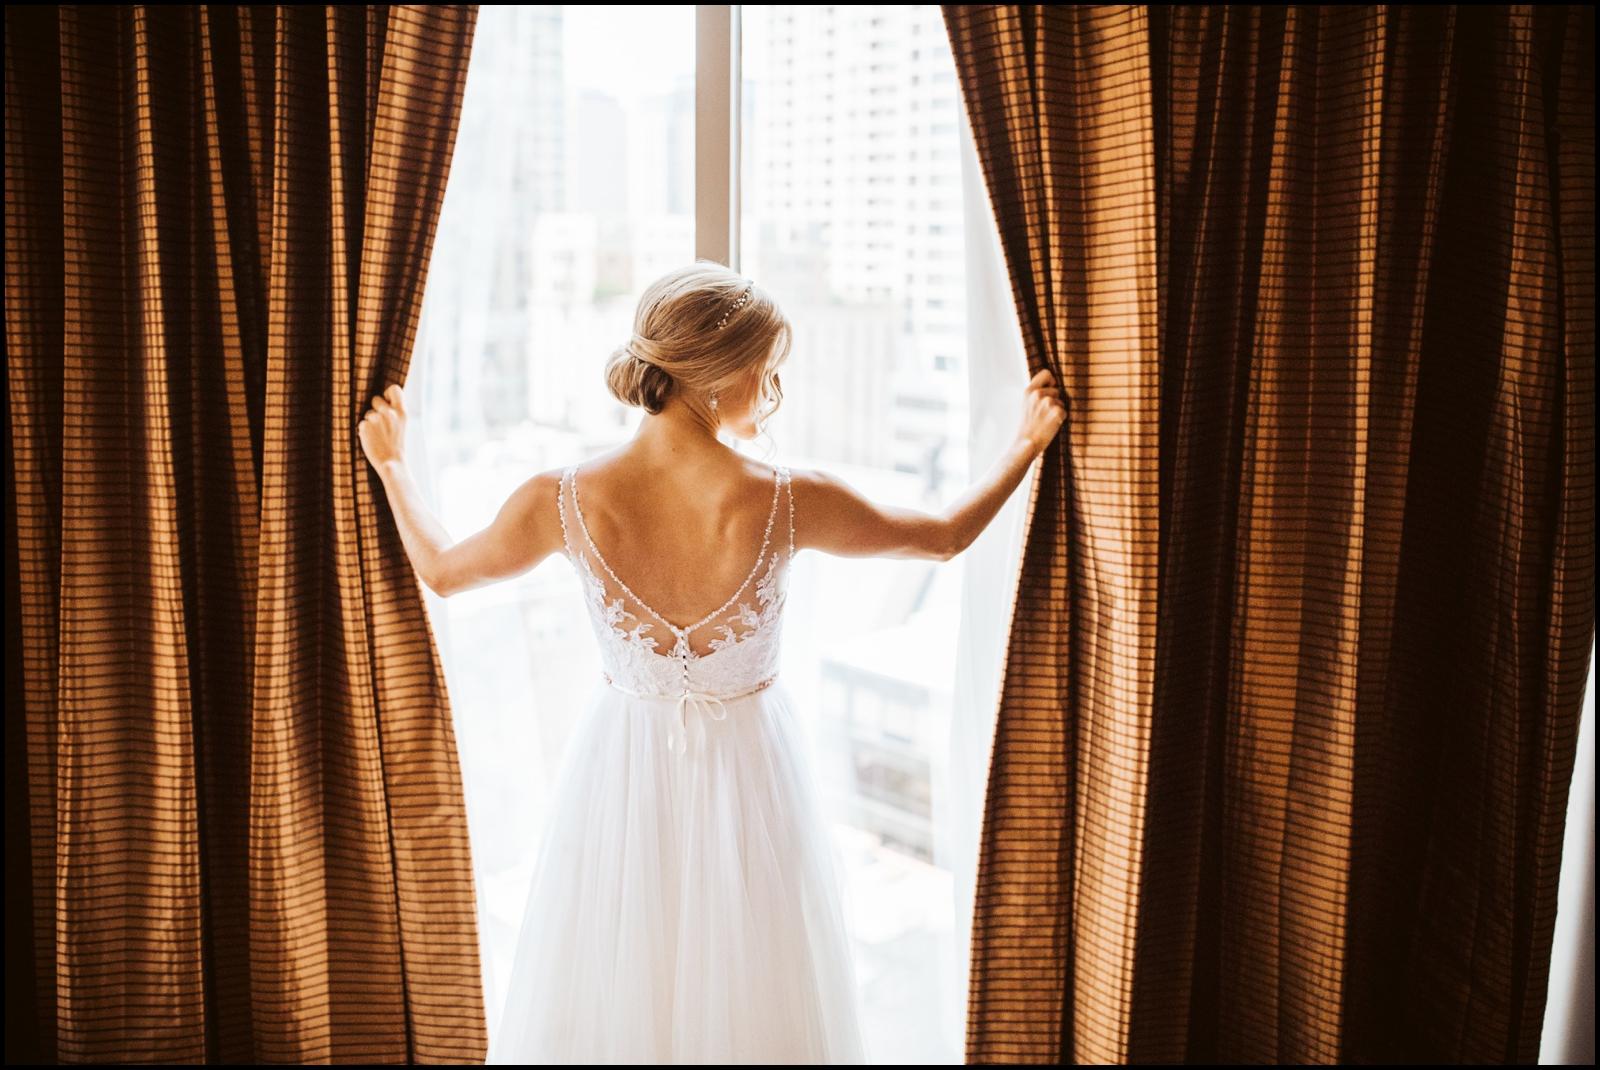 Bride wearing her bridal dress